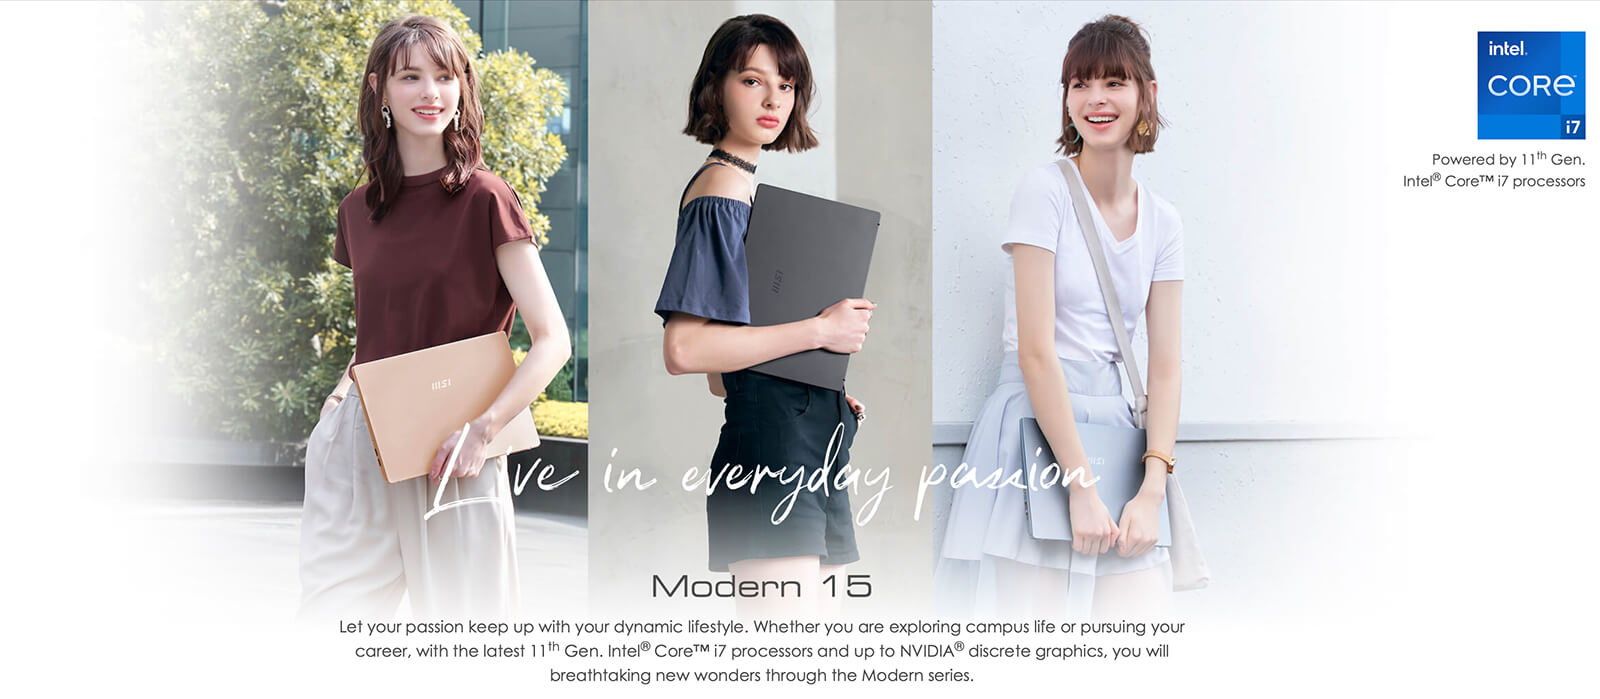 Giới thiệu chung MSI Modern 15